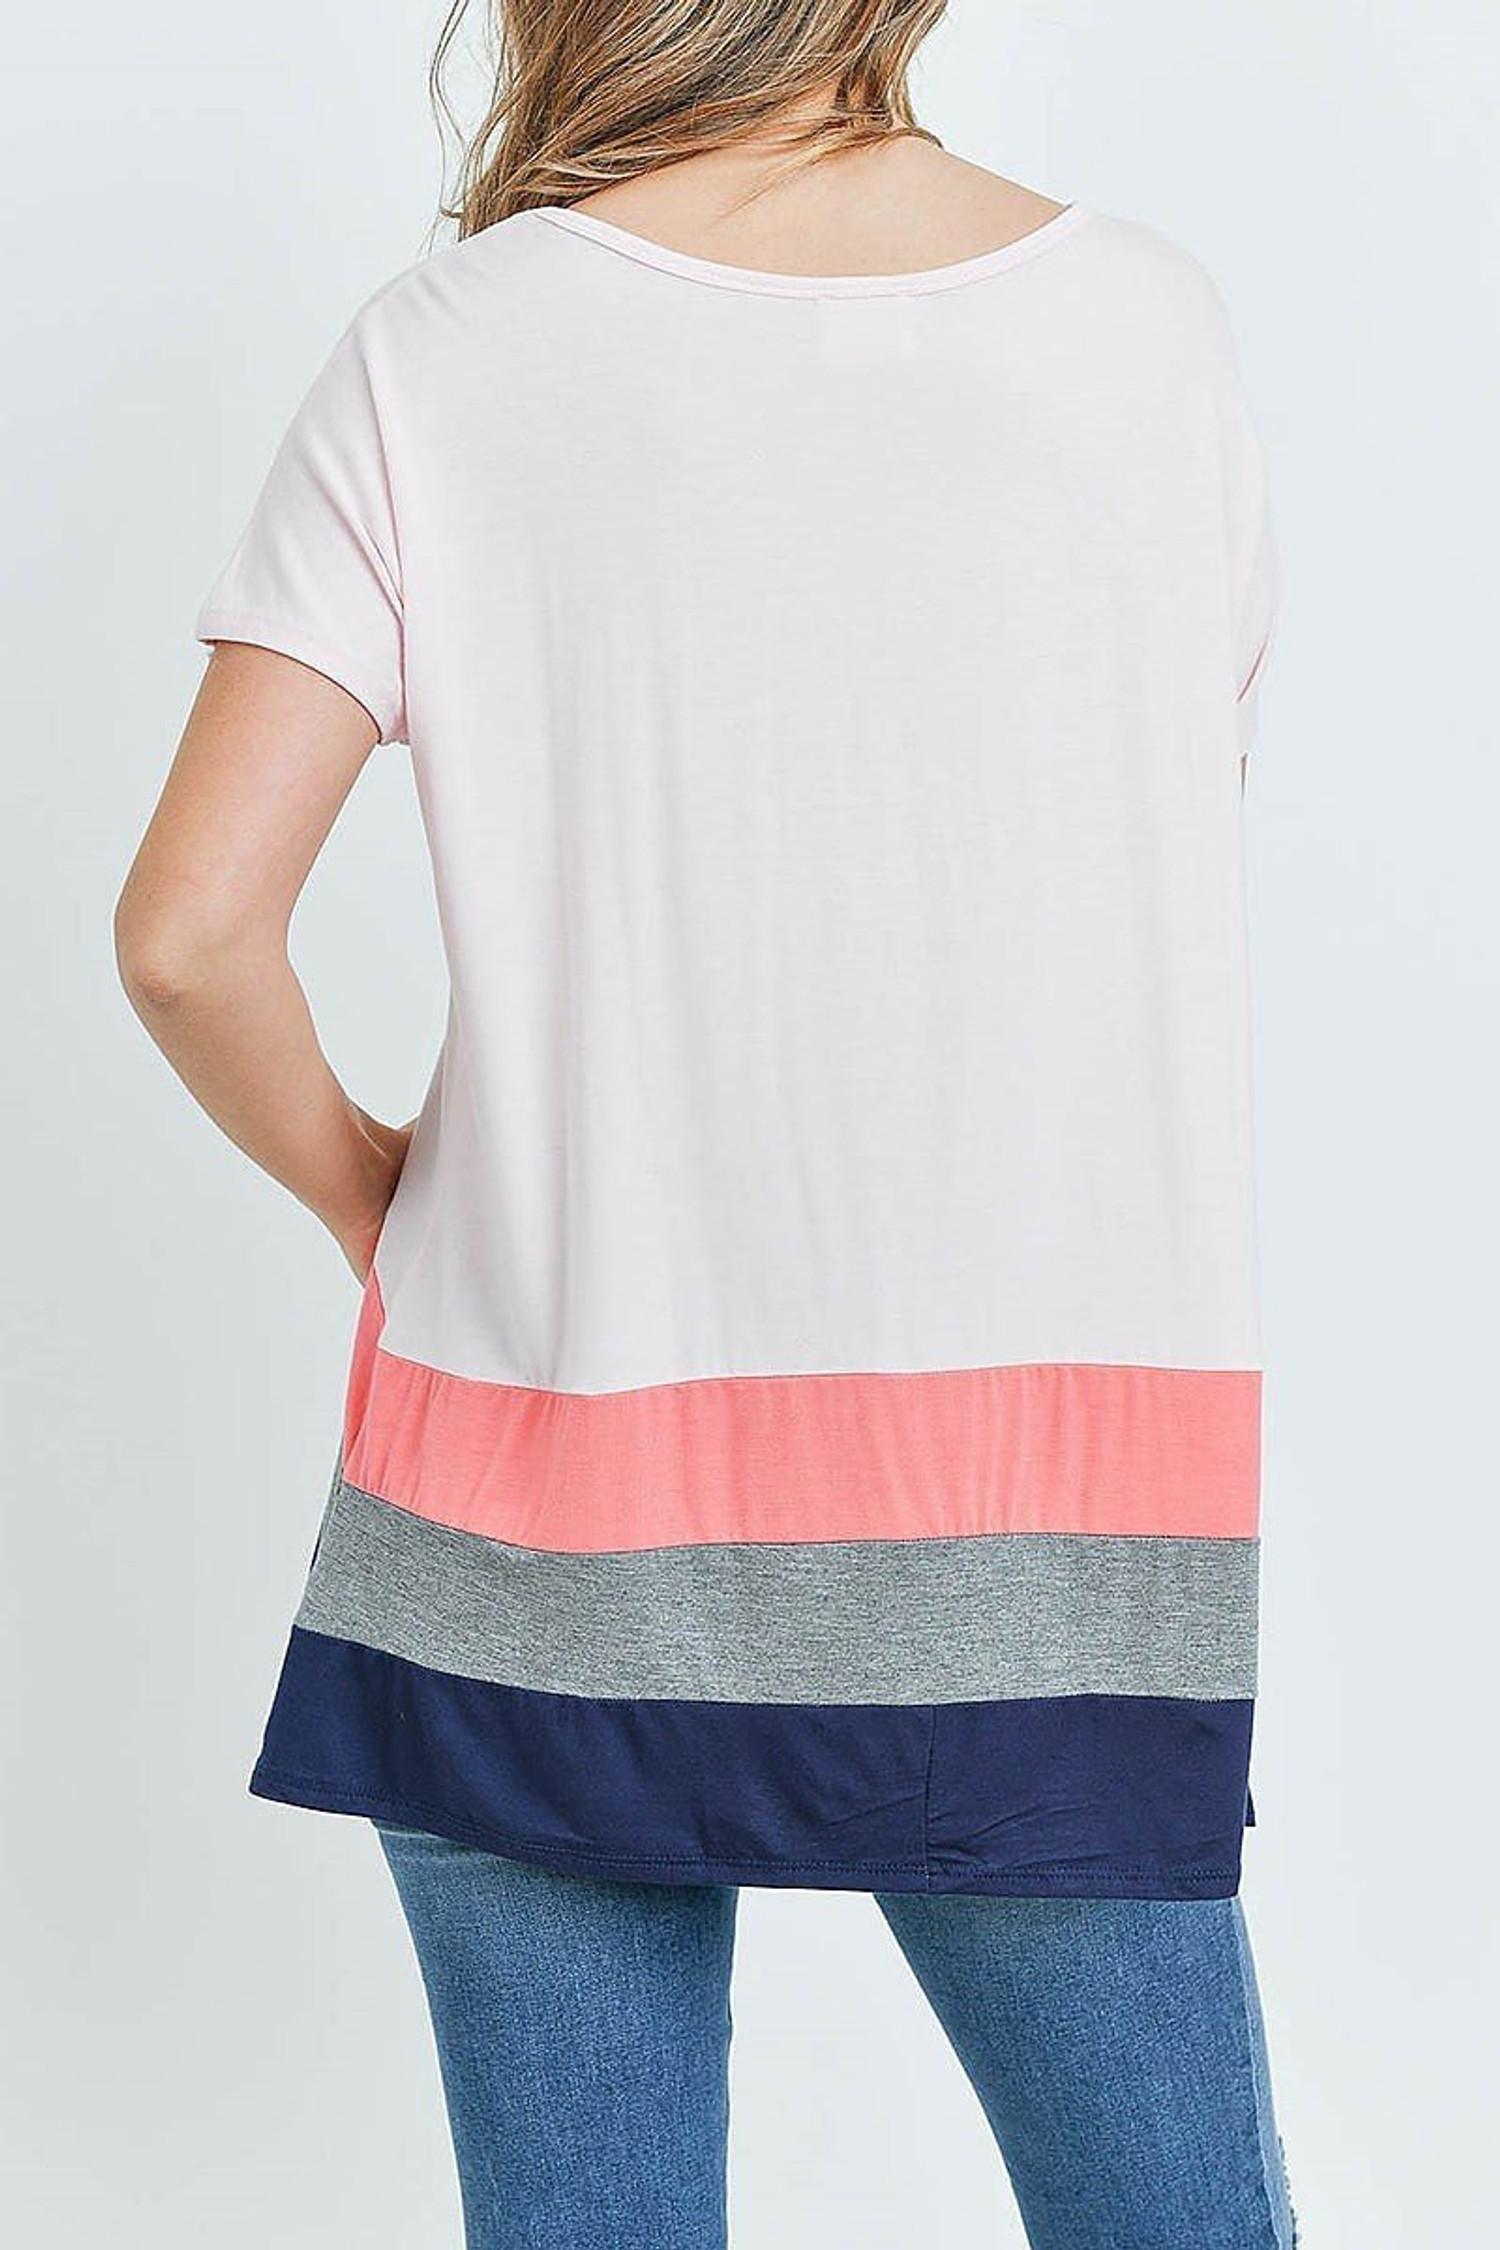 Striped Color Block Hem Short Sleeve Tunic